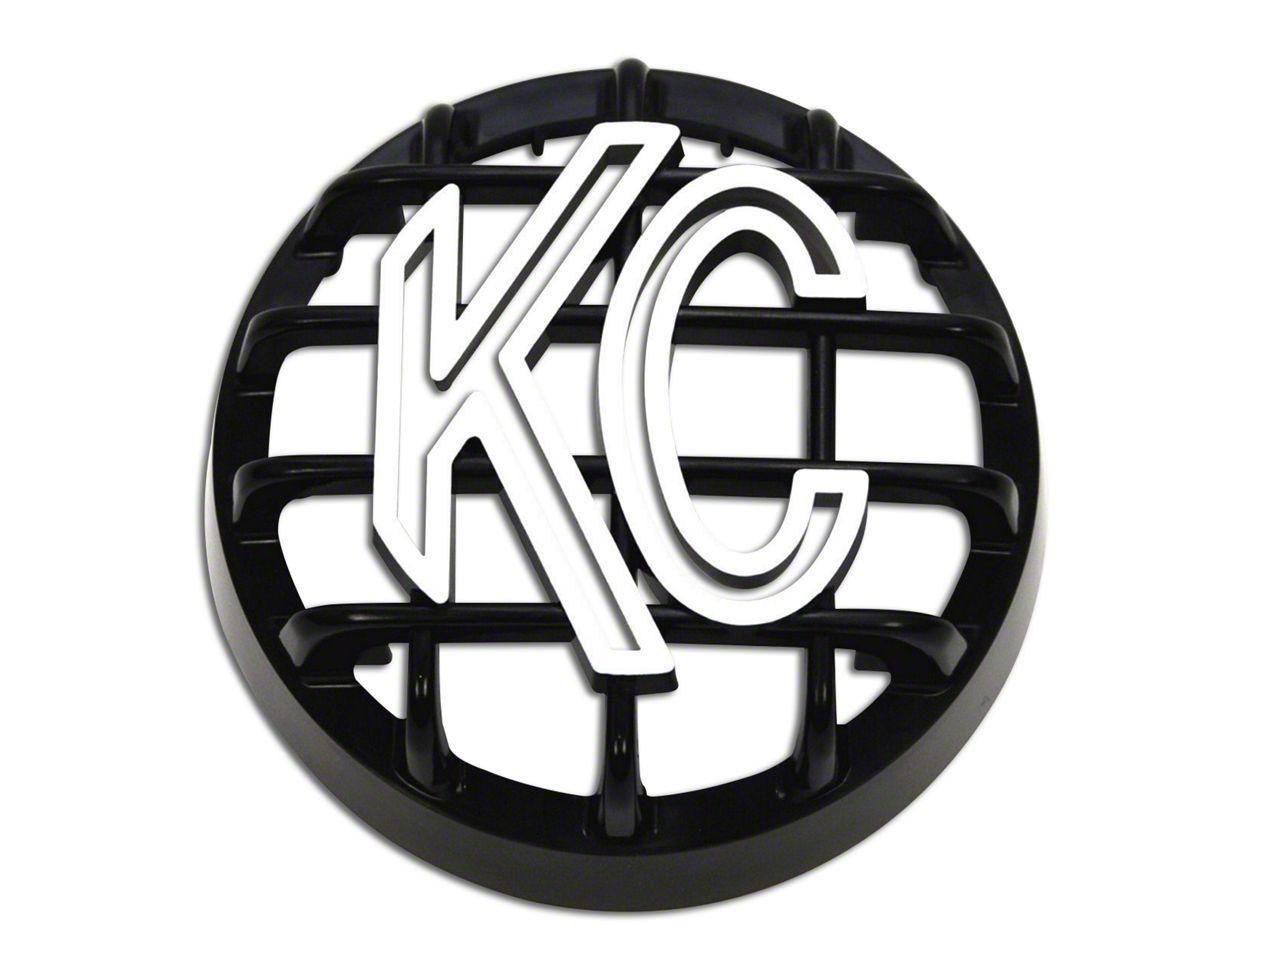 KC HiLiTES 4 in. Round Stone Guard for Rally 400 - Black w/ White KC Logo (07-19 Sierra 1500)